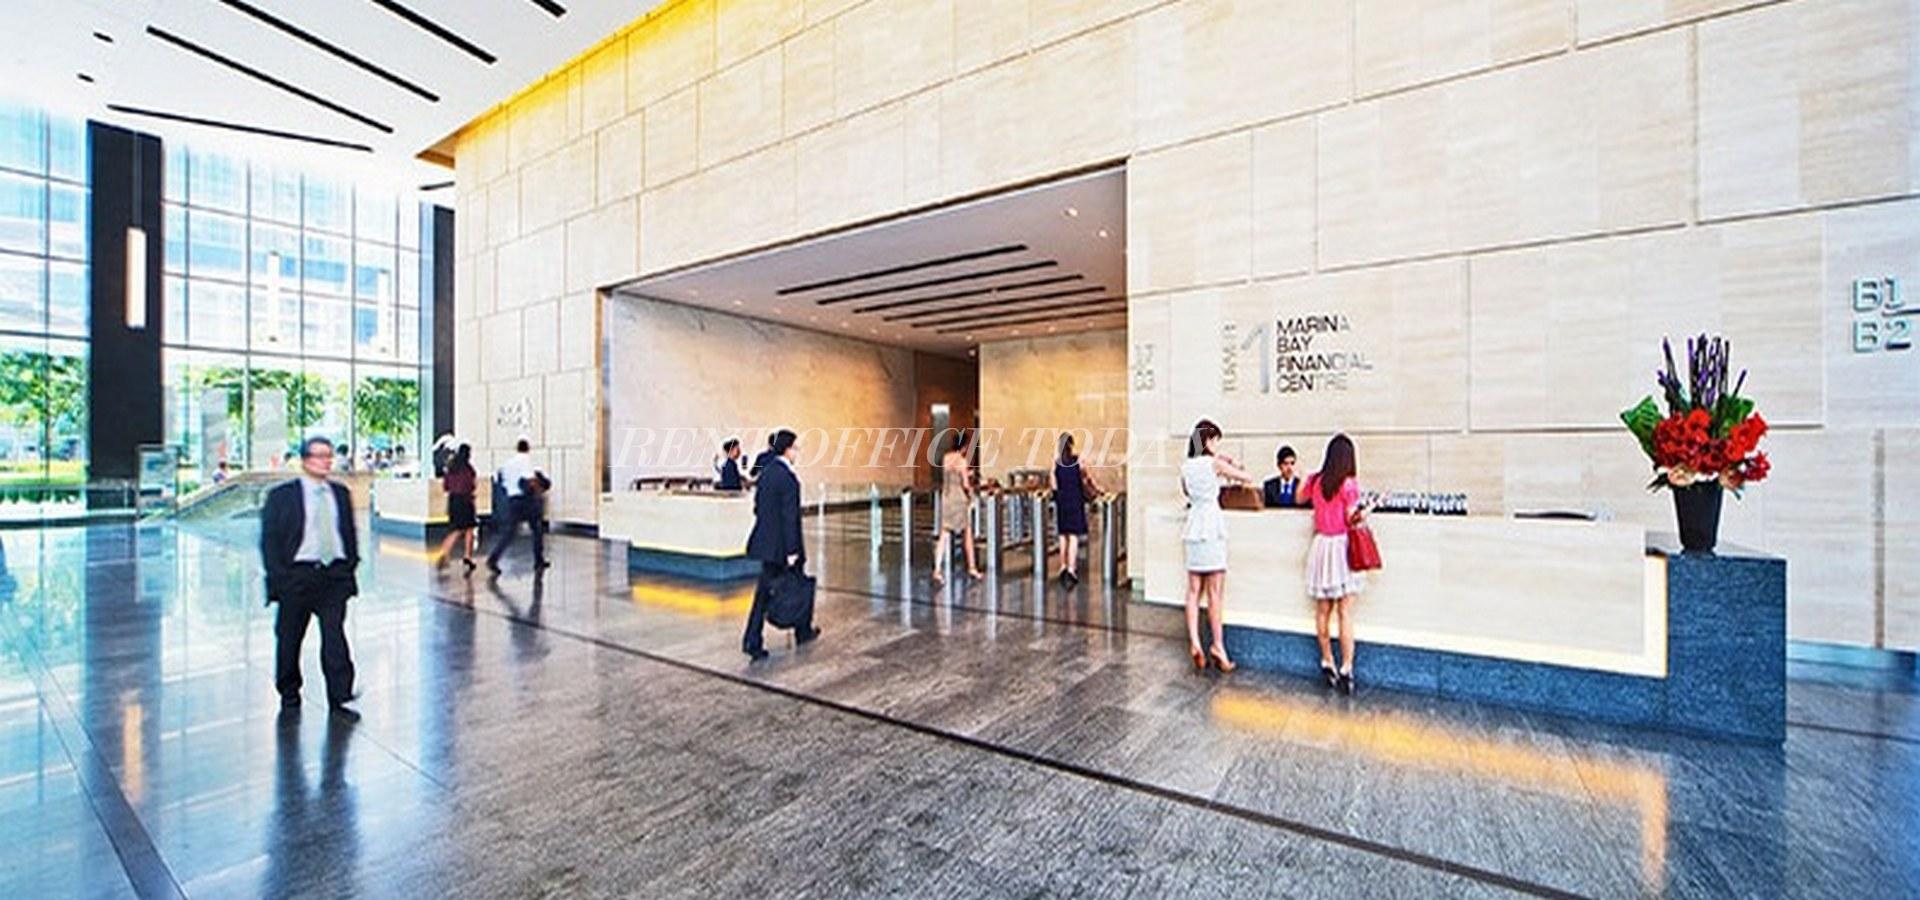 бизнес центр marina bay financial centre-3